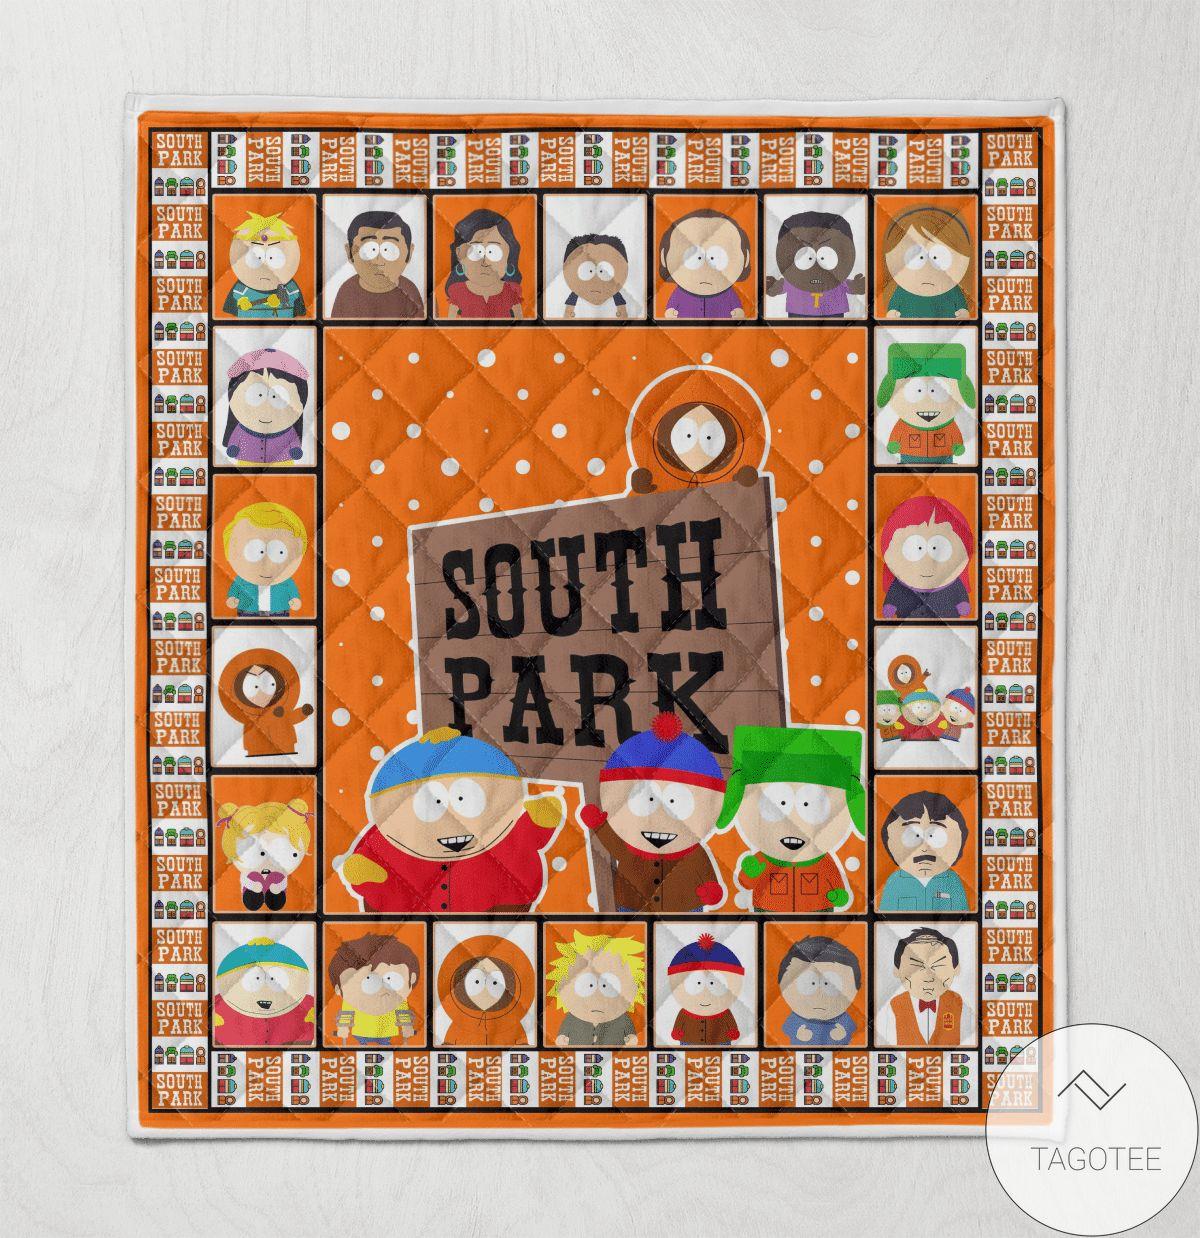 South Park Blanket Quilt